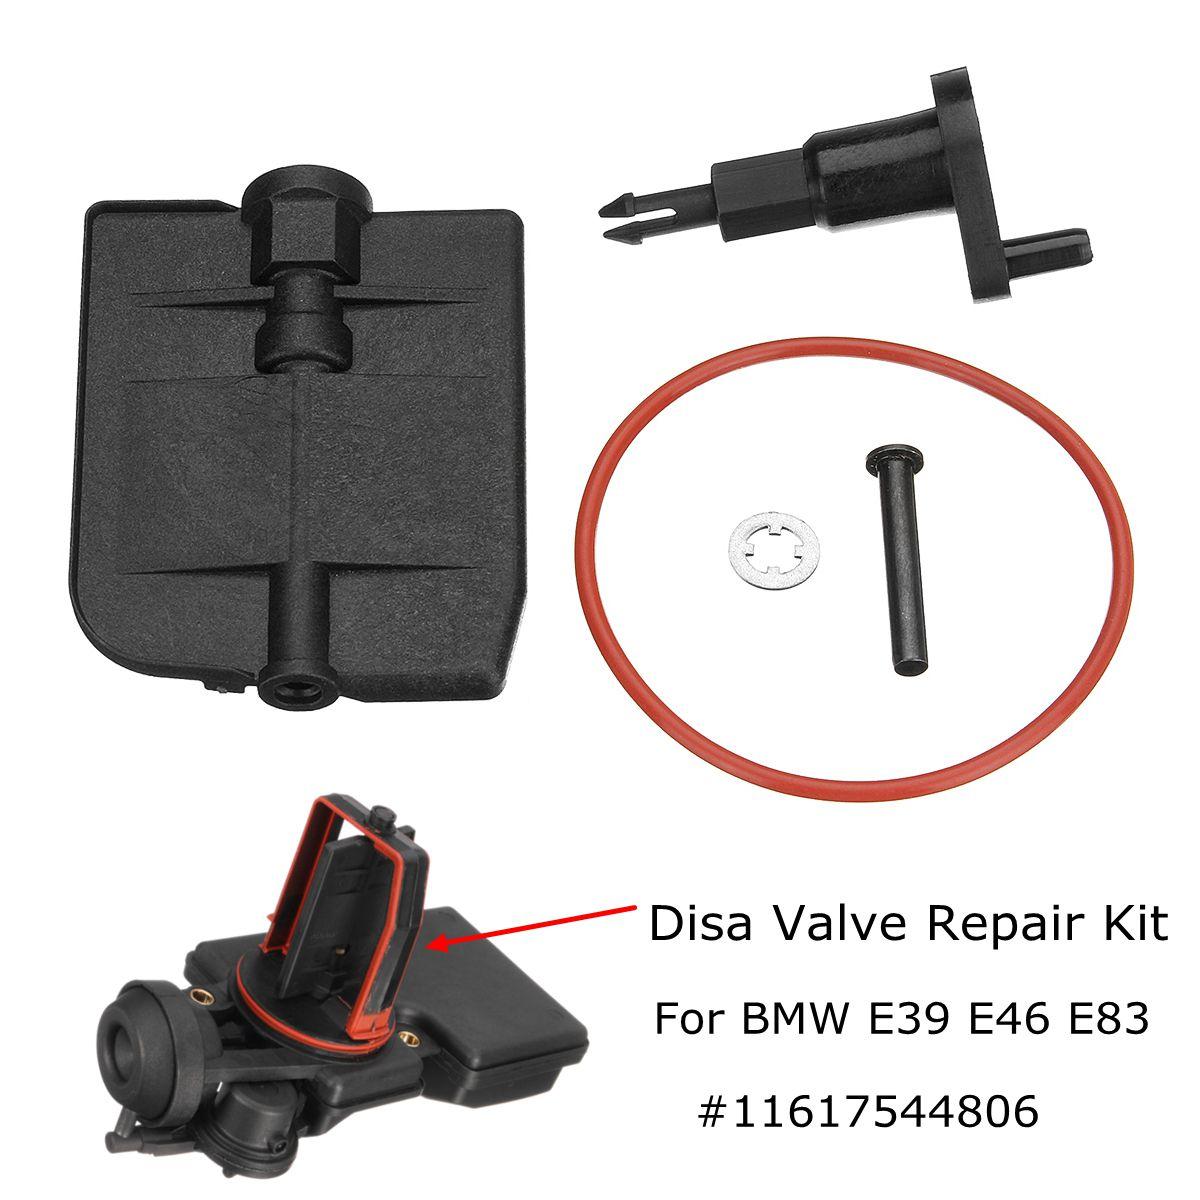 Intake Manifold DISA ชุดซ่อมวาล์ว 11617544806 สำหรับ BMW E39 E46 E83 325i 525i M54 2.5 2001-2006